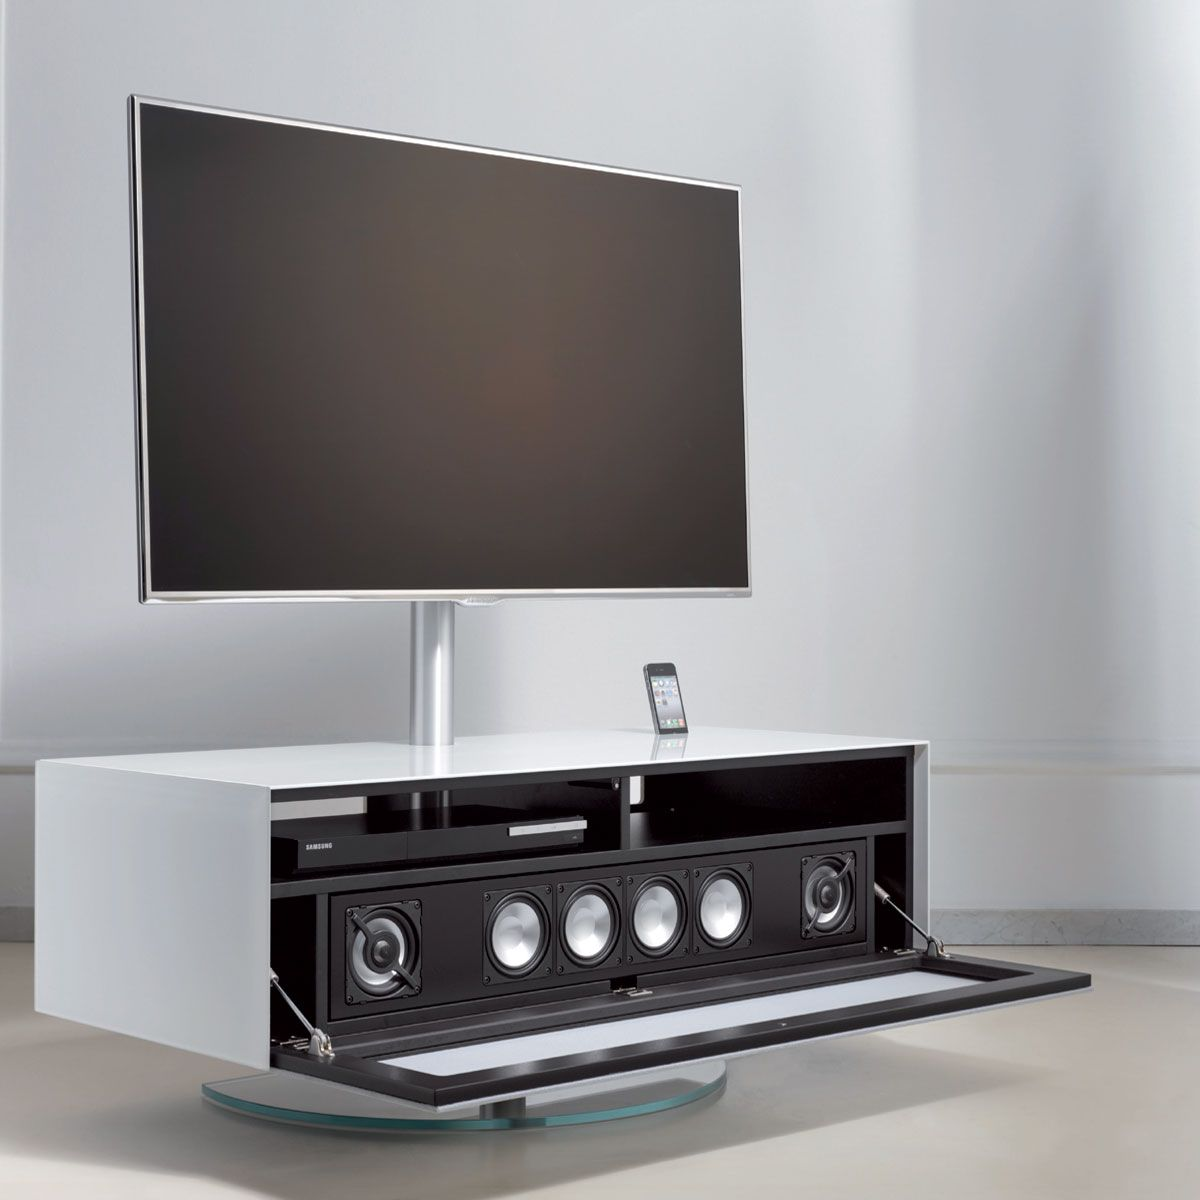 Hifi Design Möbel tolle tv hifi möbel design deutsche deko hifi möbel